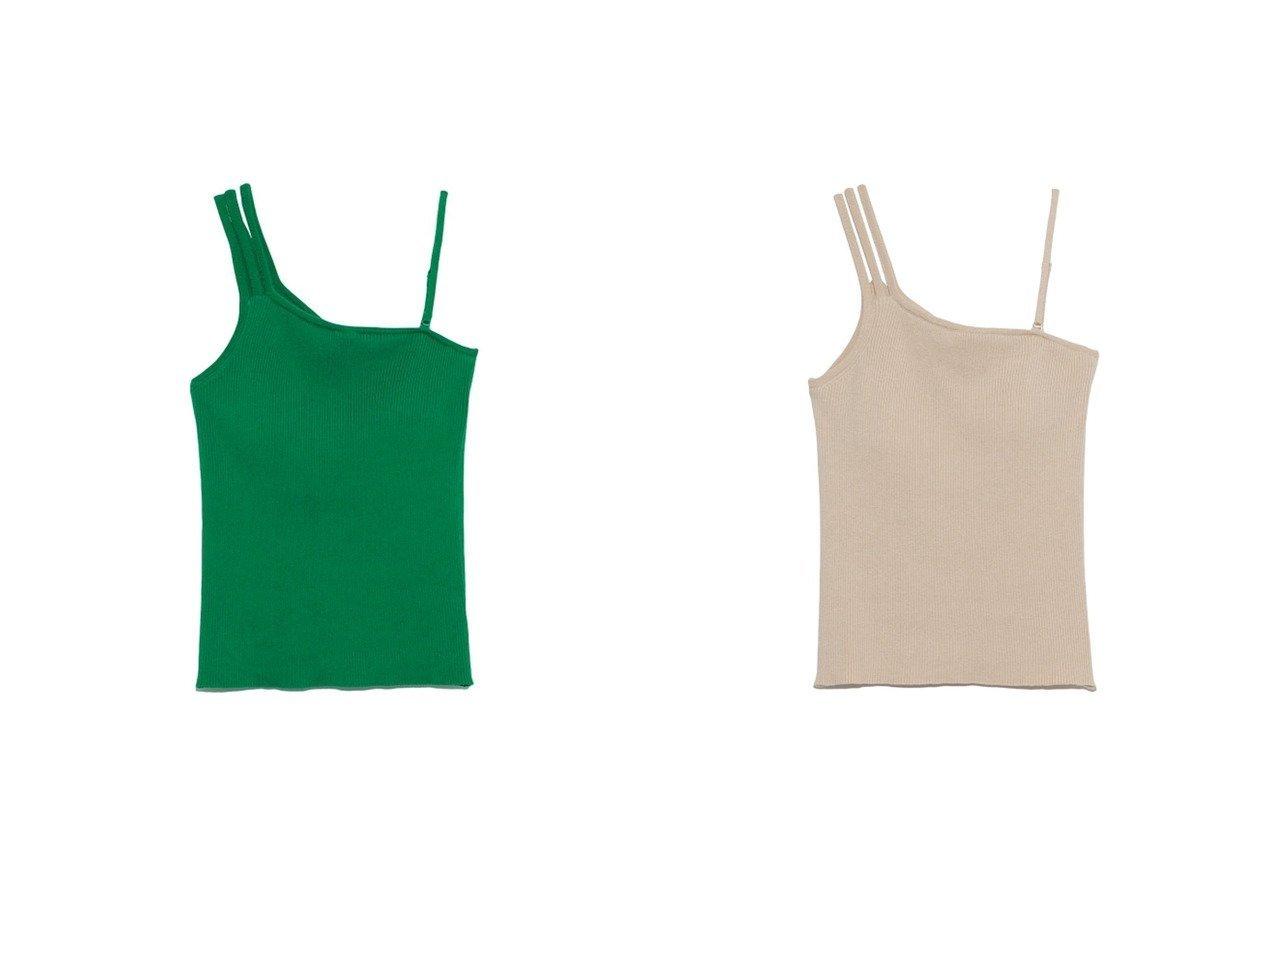 【Lily Brown/リリーブラウン】のカップインアシメタンク Lily Brownのおすすめ!人気、トレンド・レディースファッションの通販 おすすめで人気の流行・トレンド、ファッションの通販商品 メンズファッション・キッズファッション・インテリア・家具・レディースファッション・服の通販 founy(ファニー) https://founy.com/ ファッション Fashion レディースファッション WOMEN アシンメトリー インナー 春 Spring シルク ジャケット スマート タンク トレンド モダン ラップ 2021年 2021 S/S 春夏 SS Spring/Summer 2021 春夏 S/S SS Spring/Summer 2021  ID:crp329100000019648